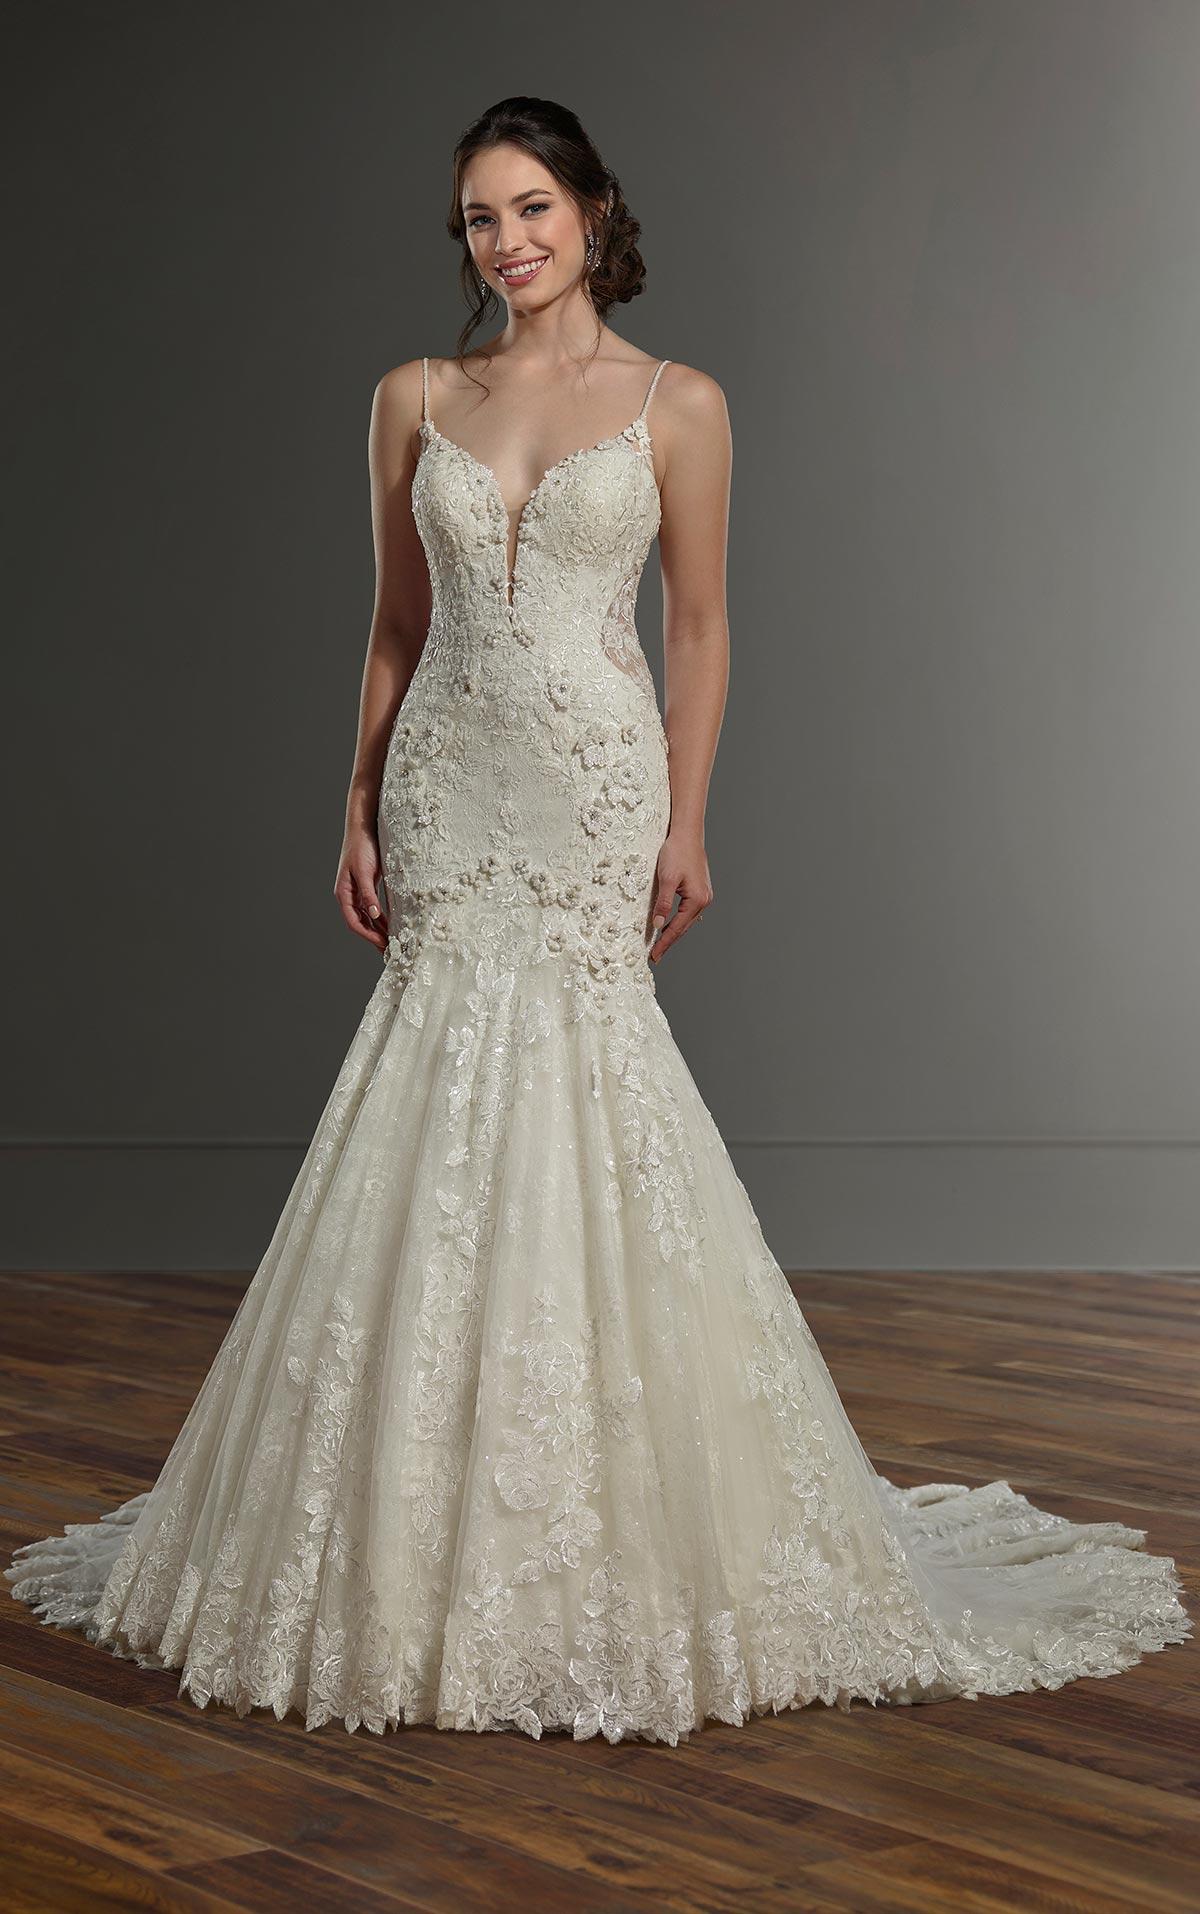 1032 By Martina Liana,Simple Dress For Wedding Sponsor